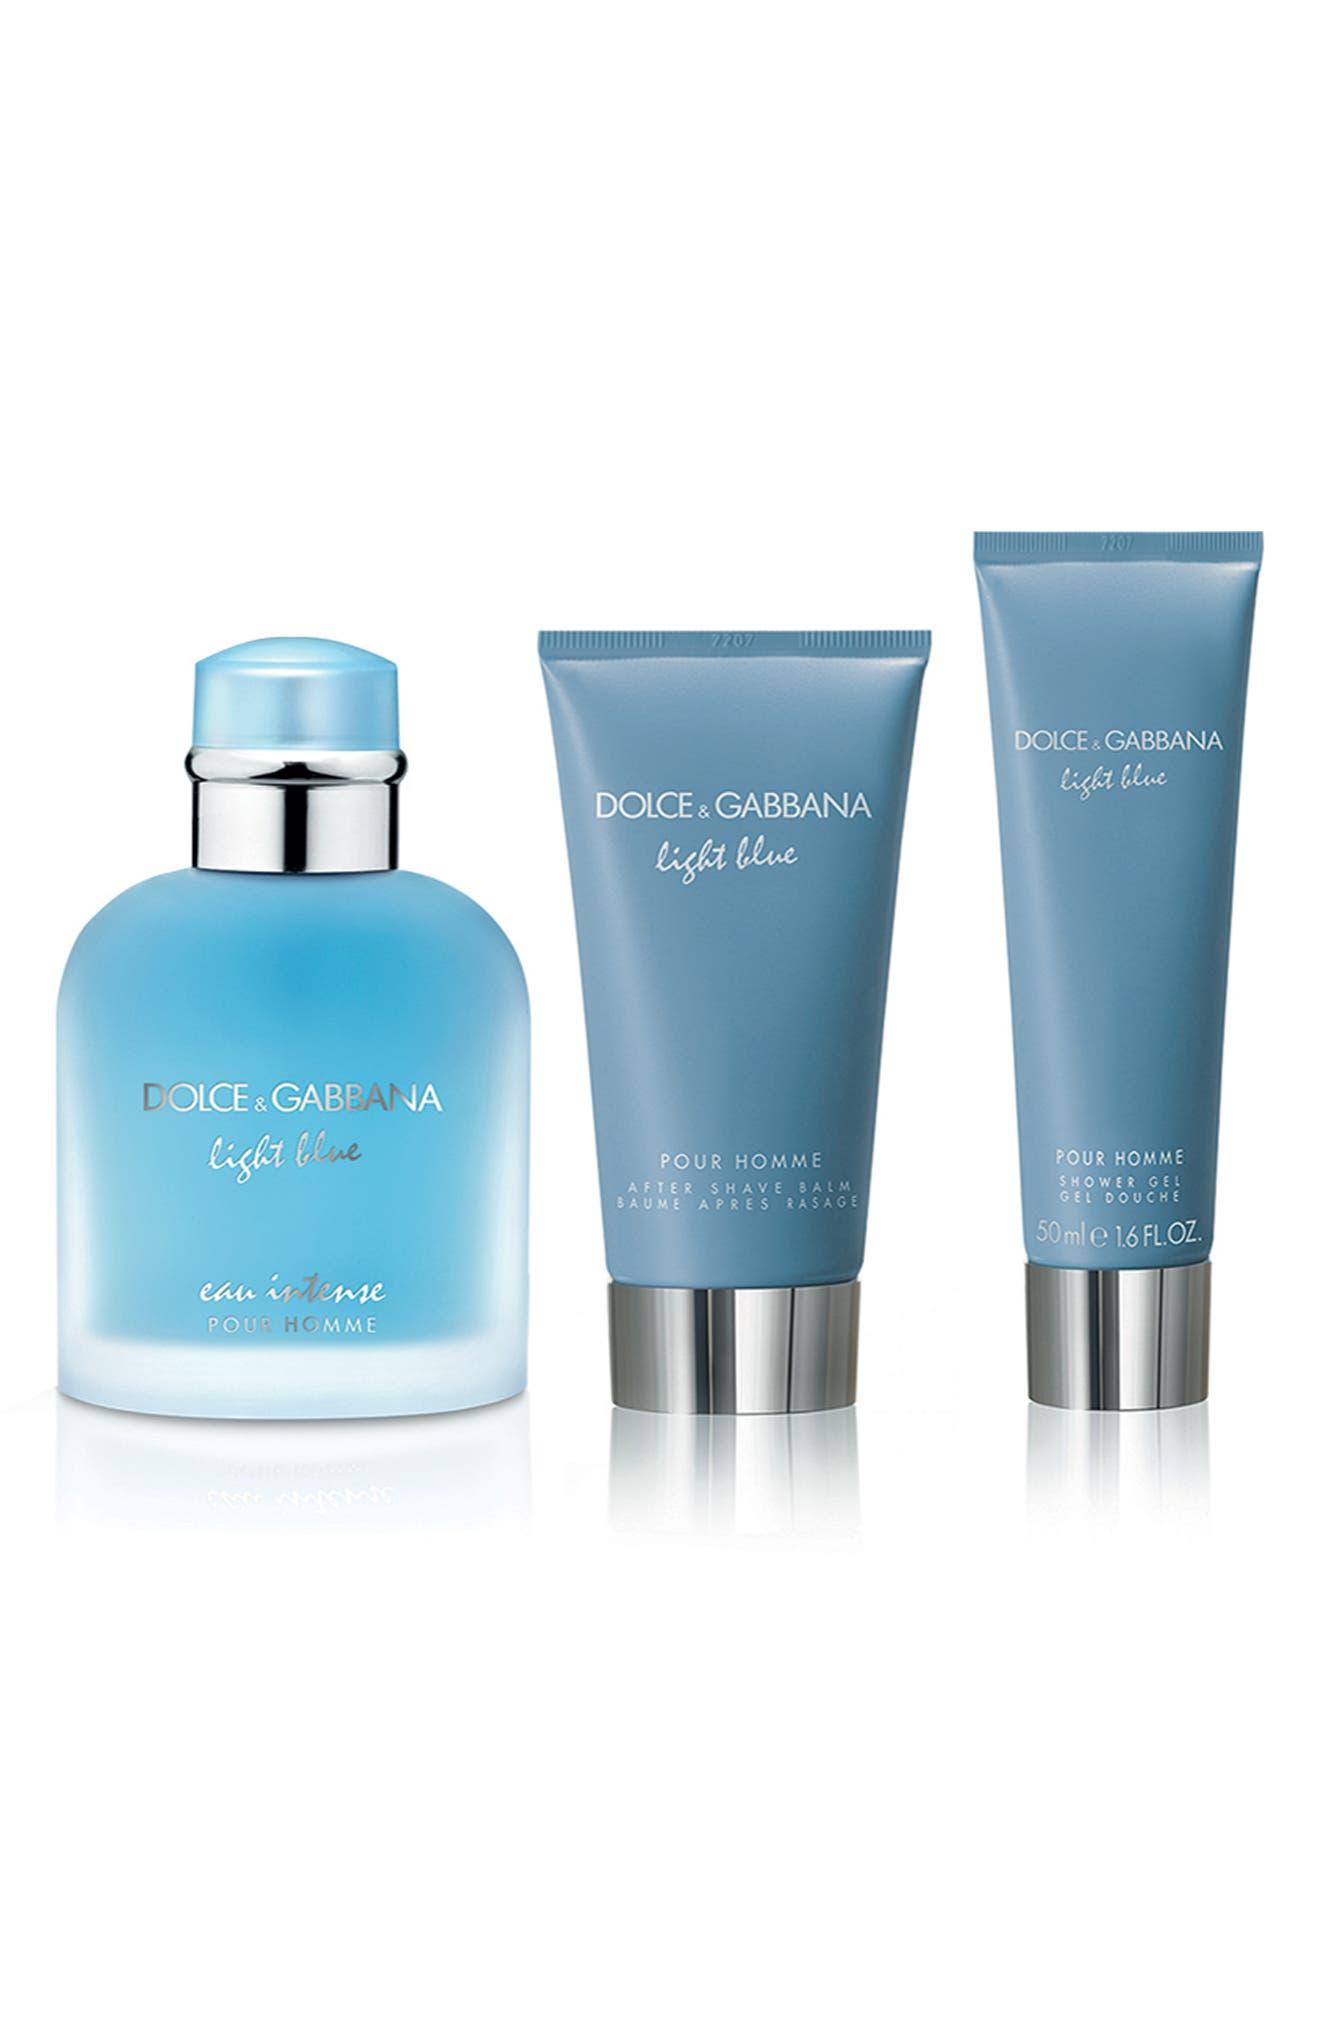 0637bc12e0c0 Dolce   Gabbana Men s Cologne   Fragrance